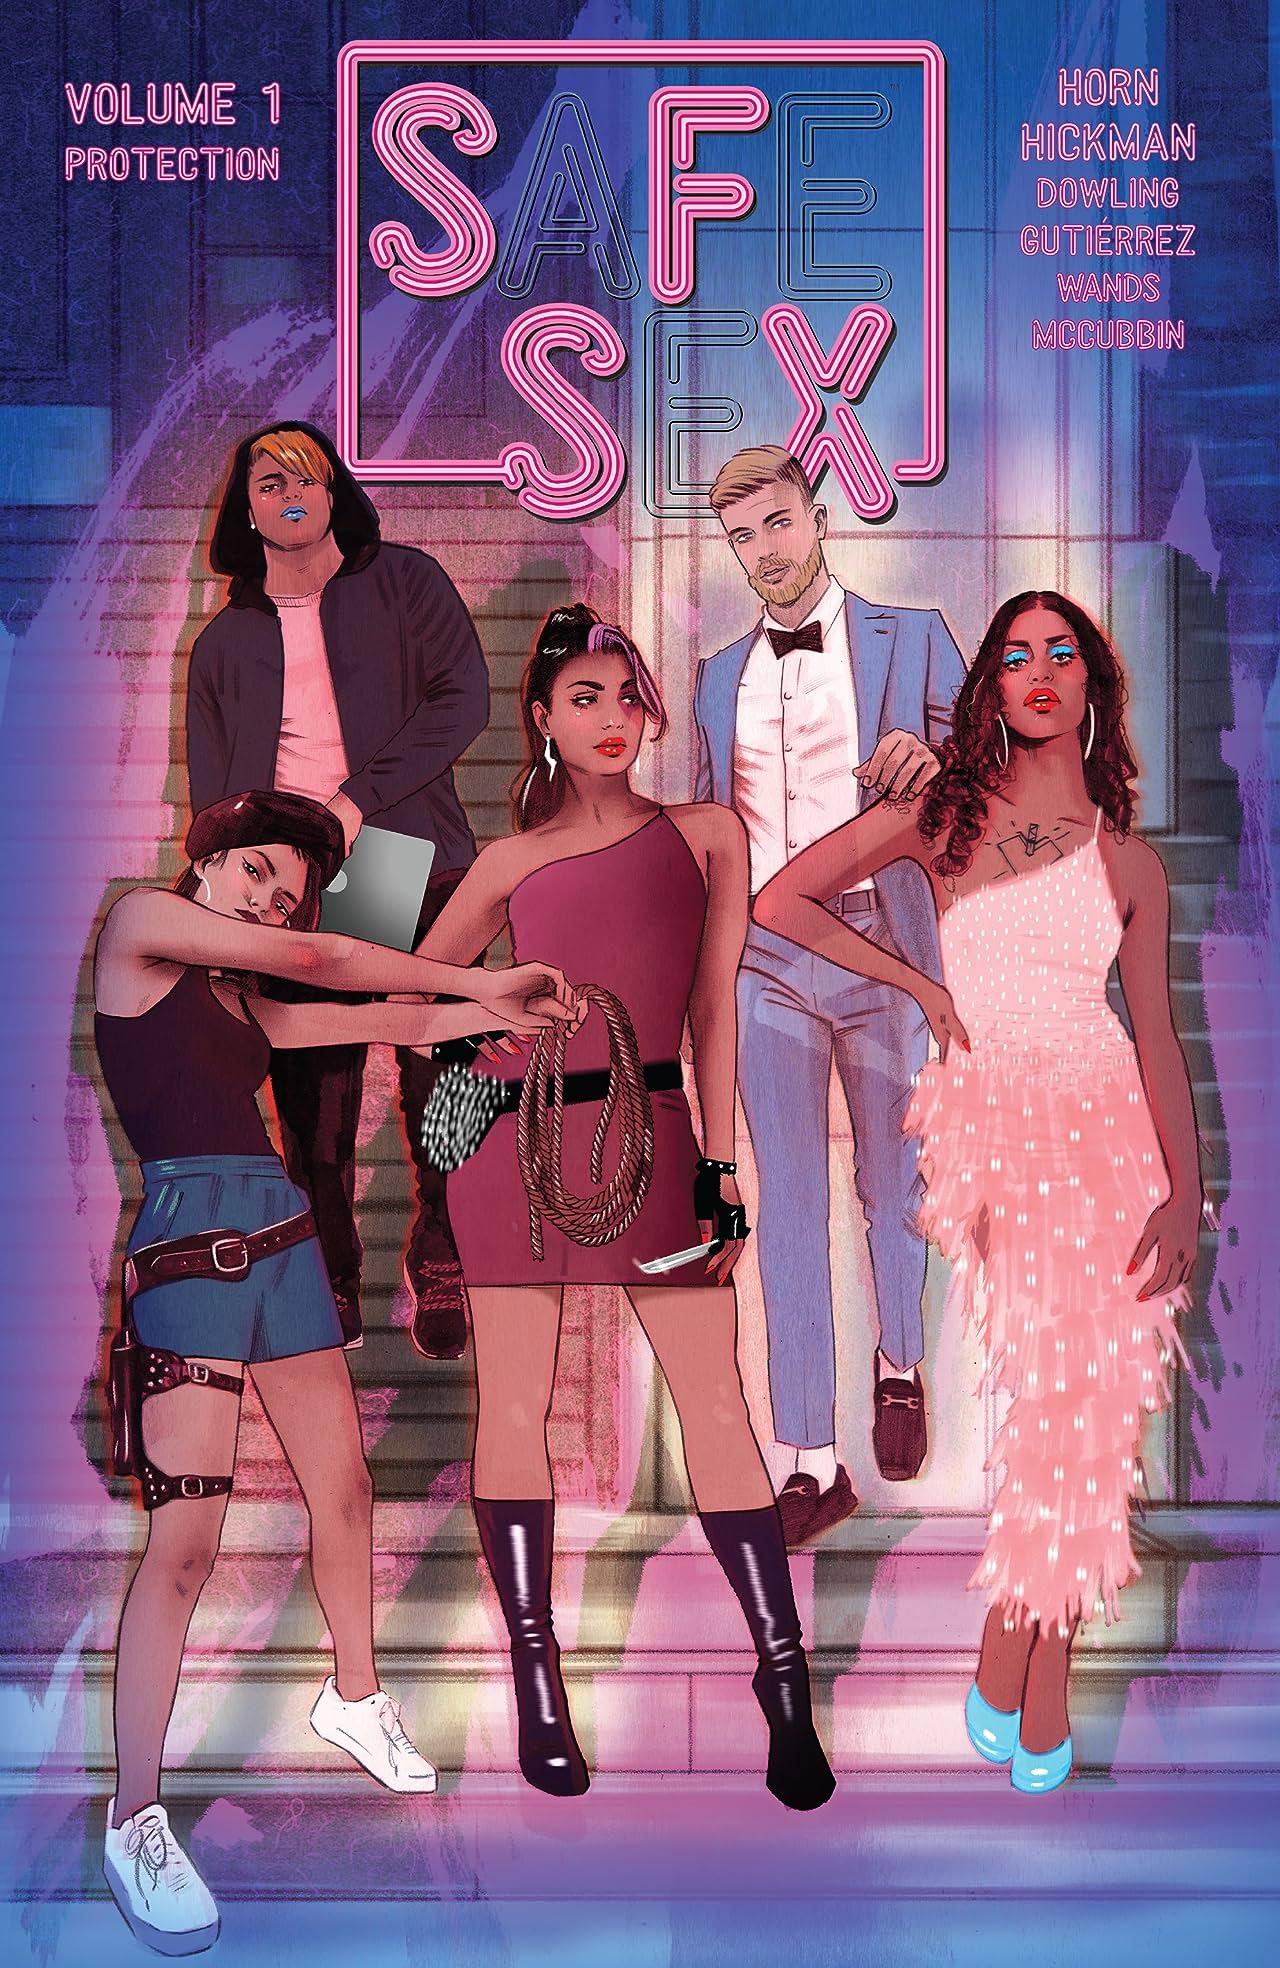 SFSX (Safe Sex) Vol. 1: Protection